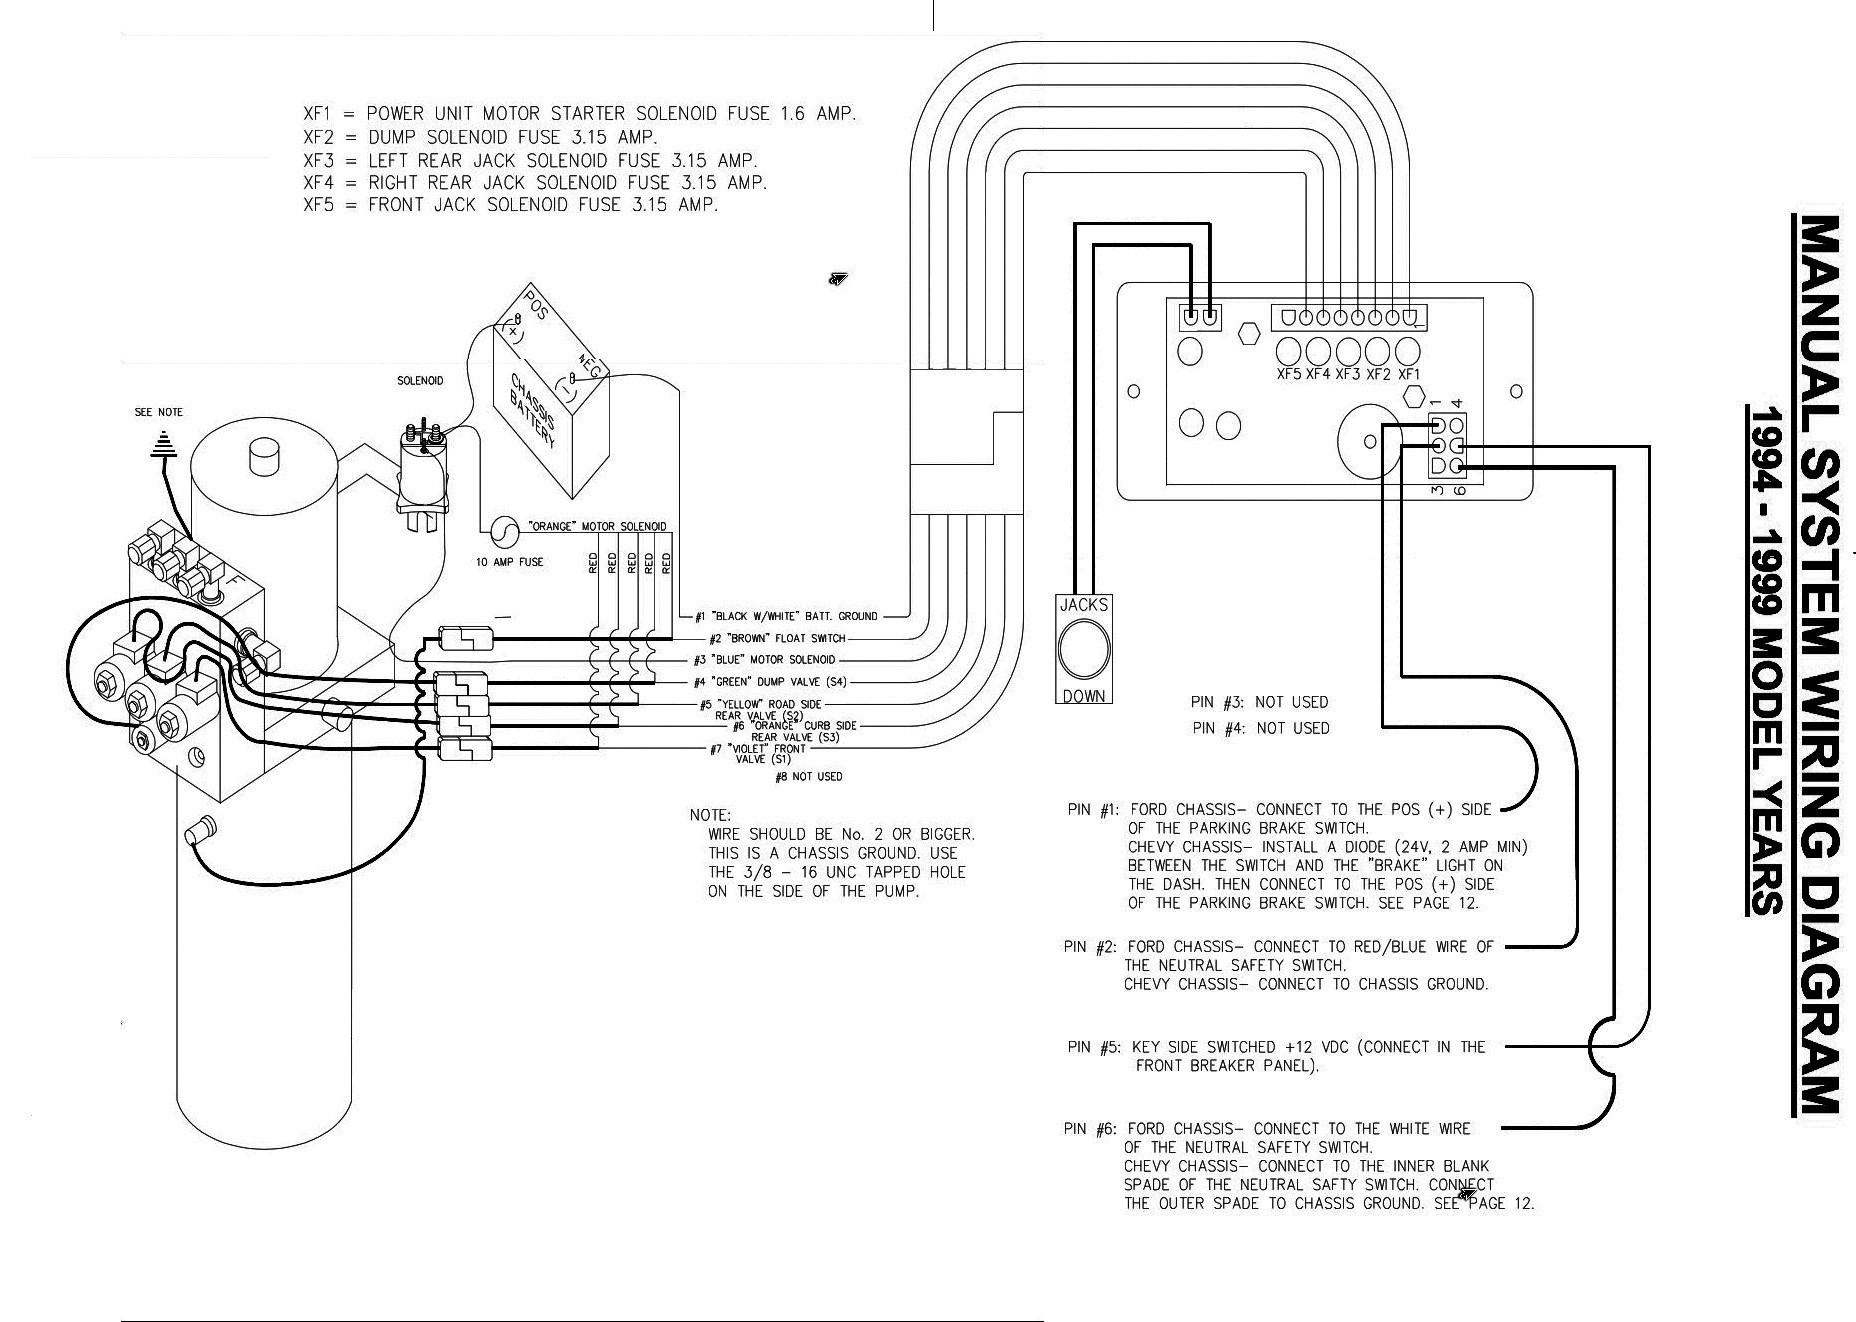 For Coachman Motorhomes Wiring Diagrams Motorhome Wiring Diagram Tiffin 1999 Wiring Diagram